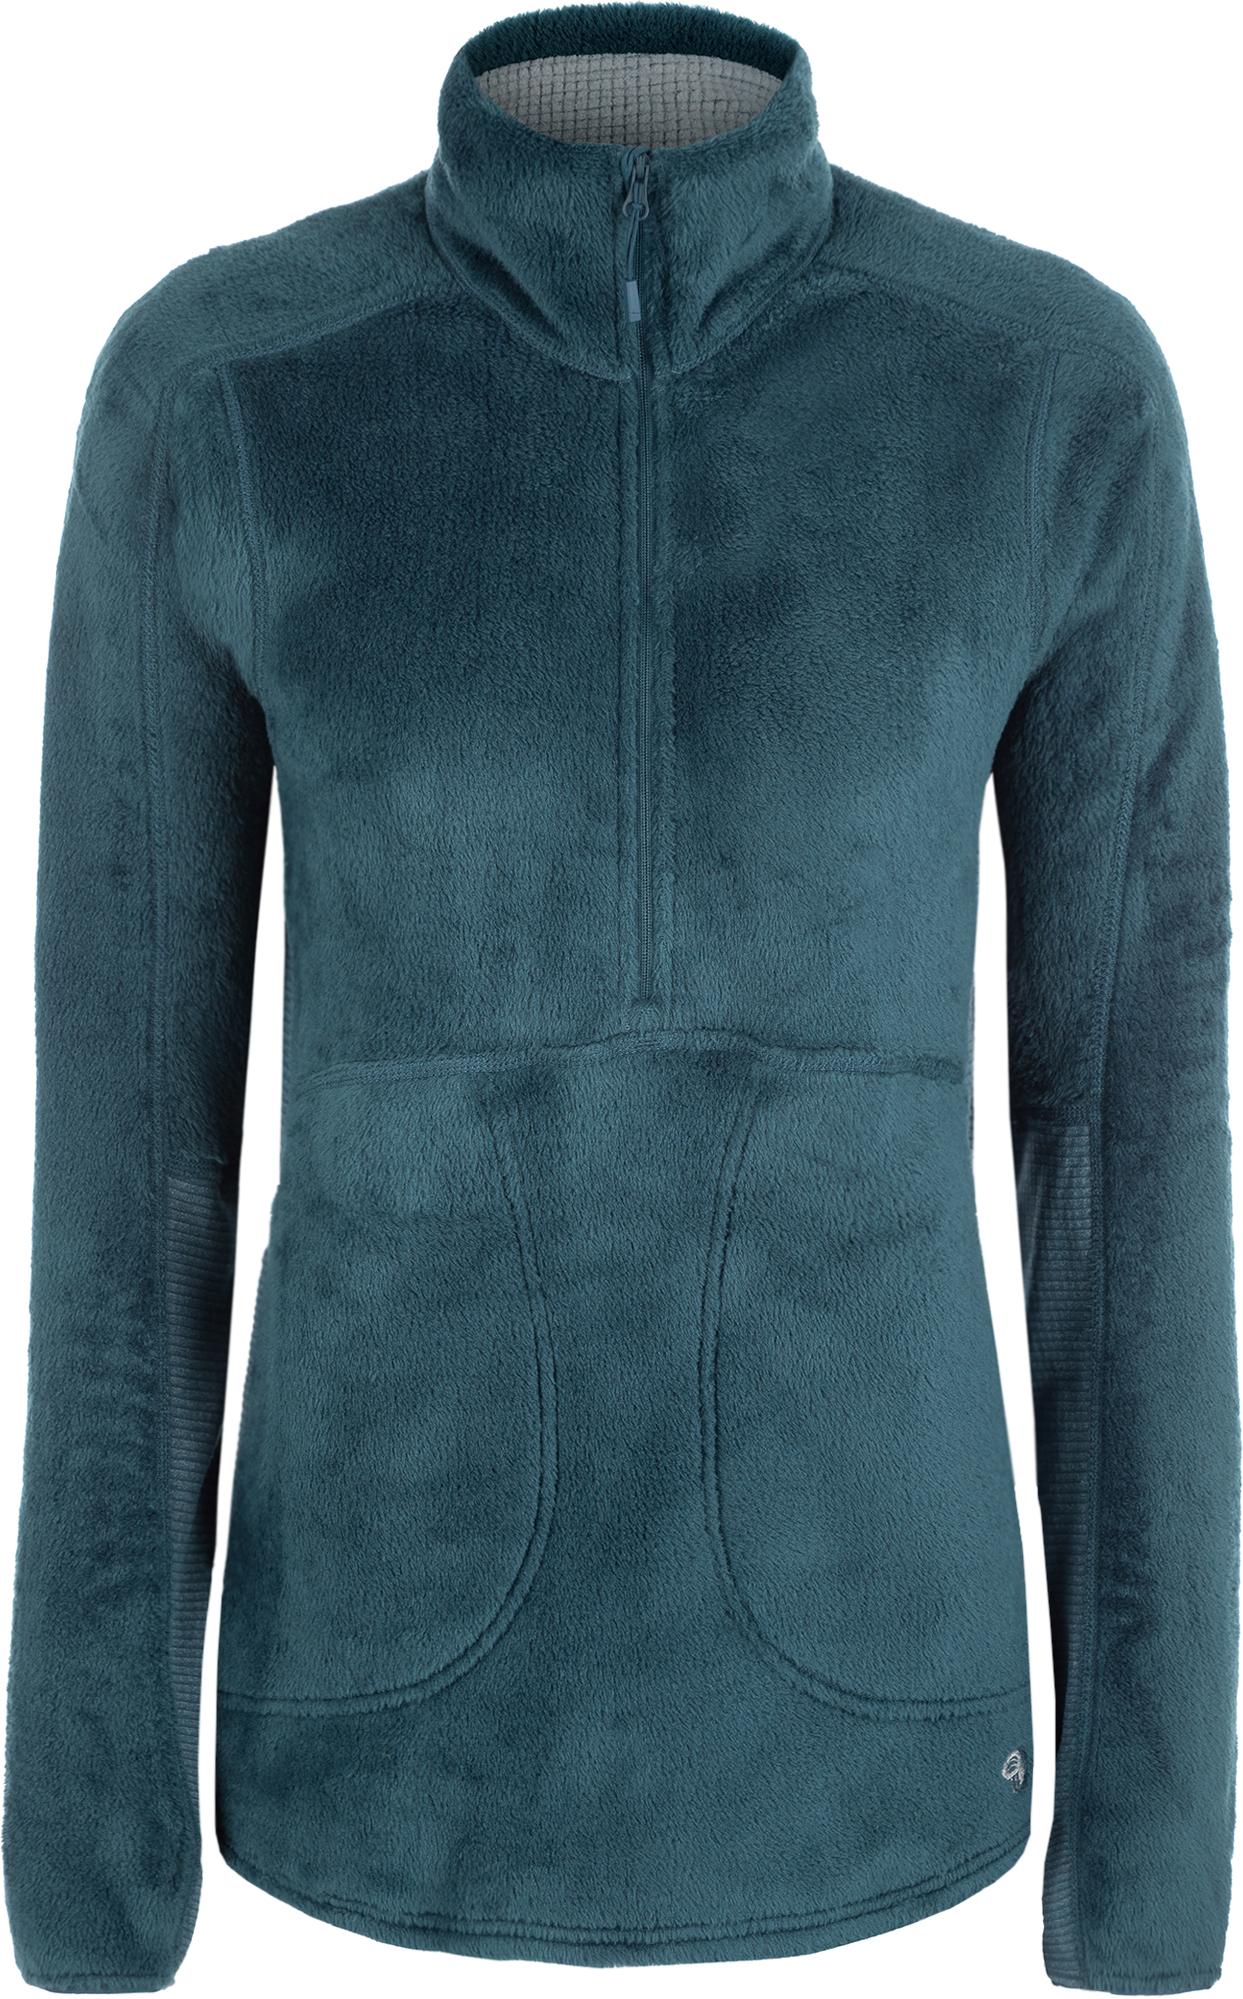 Mountain Hardwear Джемпер флисовый женский Mountain Hardwear Monkey Woman/2™, размер 50 цена в Москве и Питере